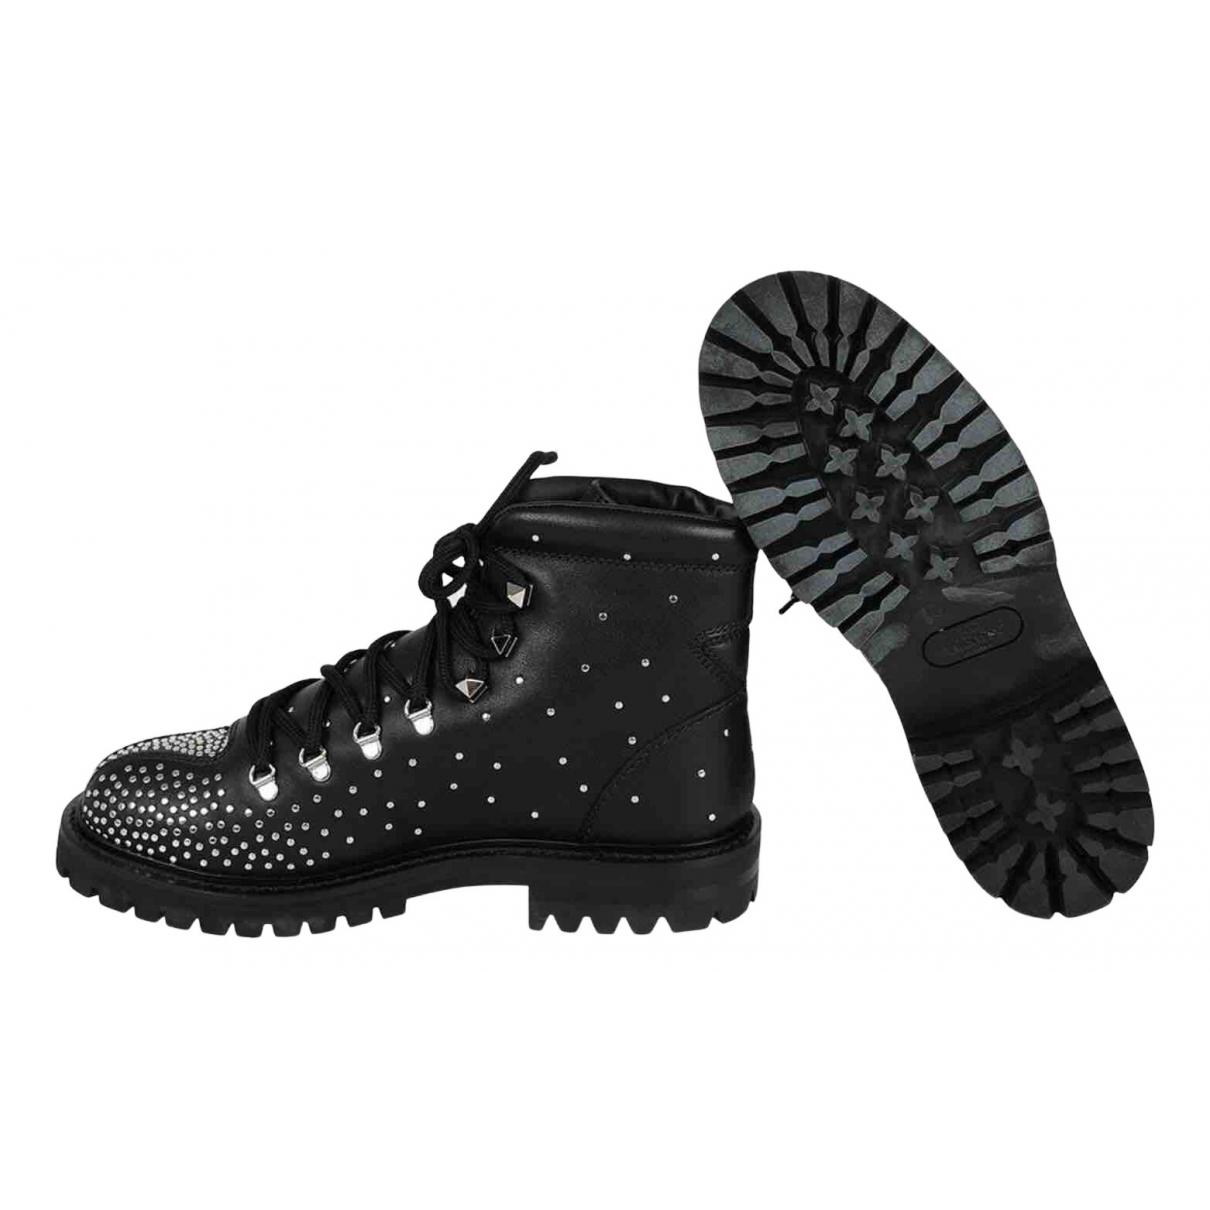 Valentino Garavani N Black Leather Ankle boots for Women 37 EU